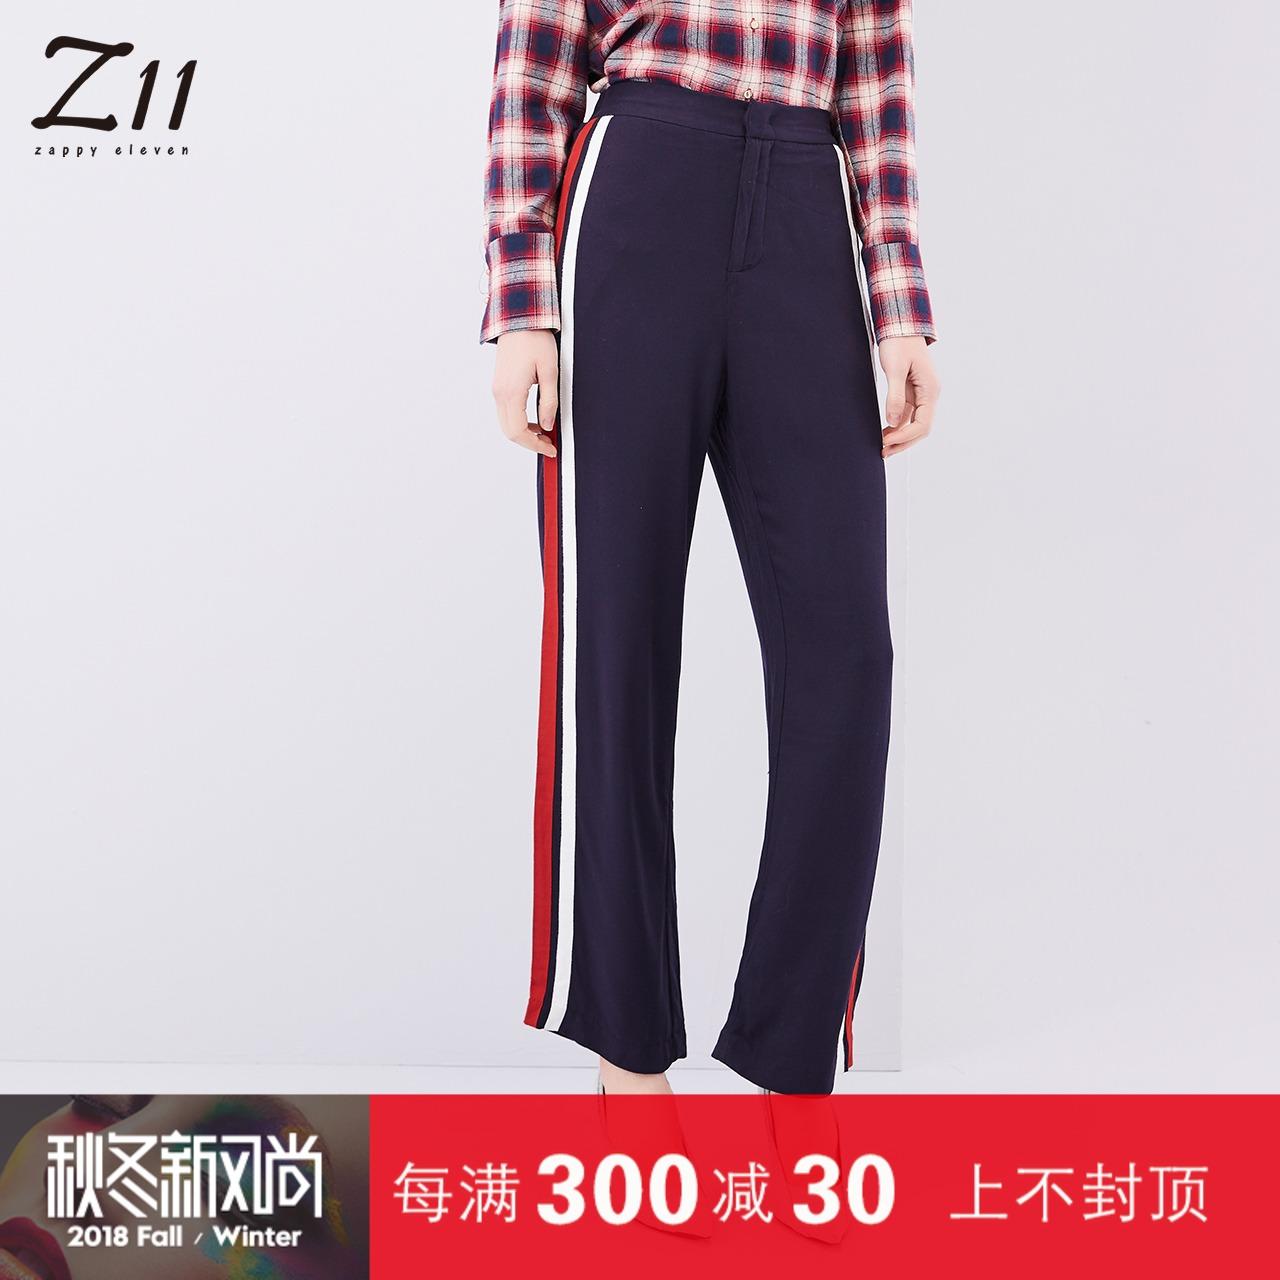 z11女装修身显瘦长裤新款显瘦条纹校服阔腿运动裤Z17CN123